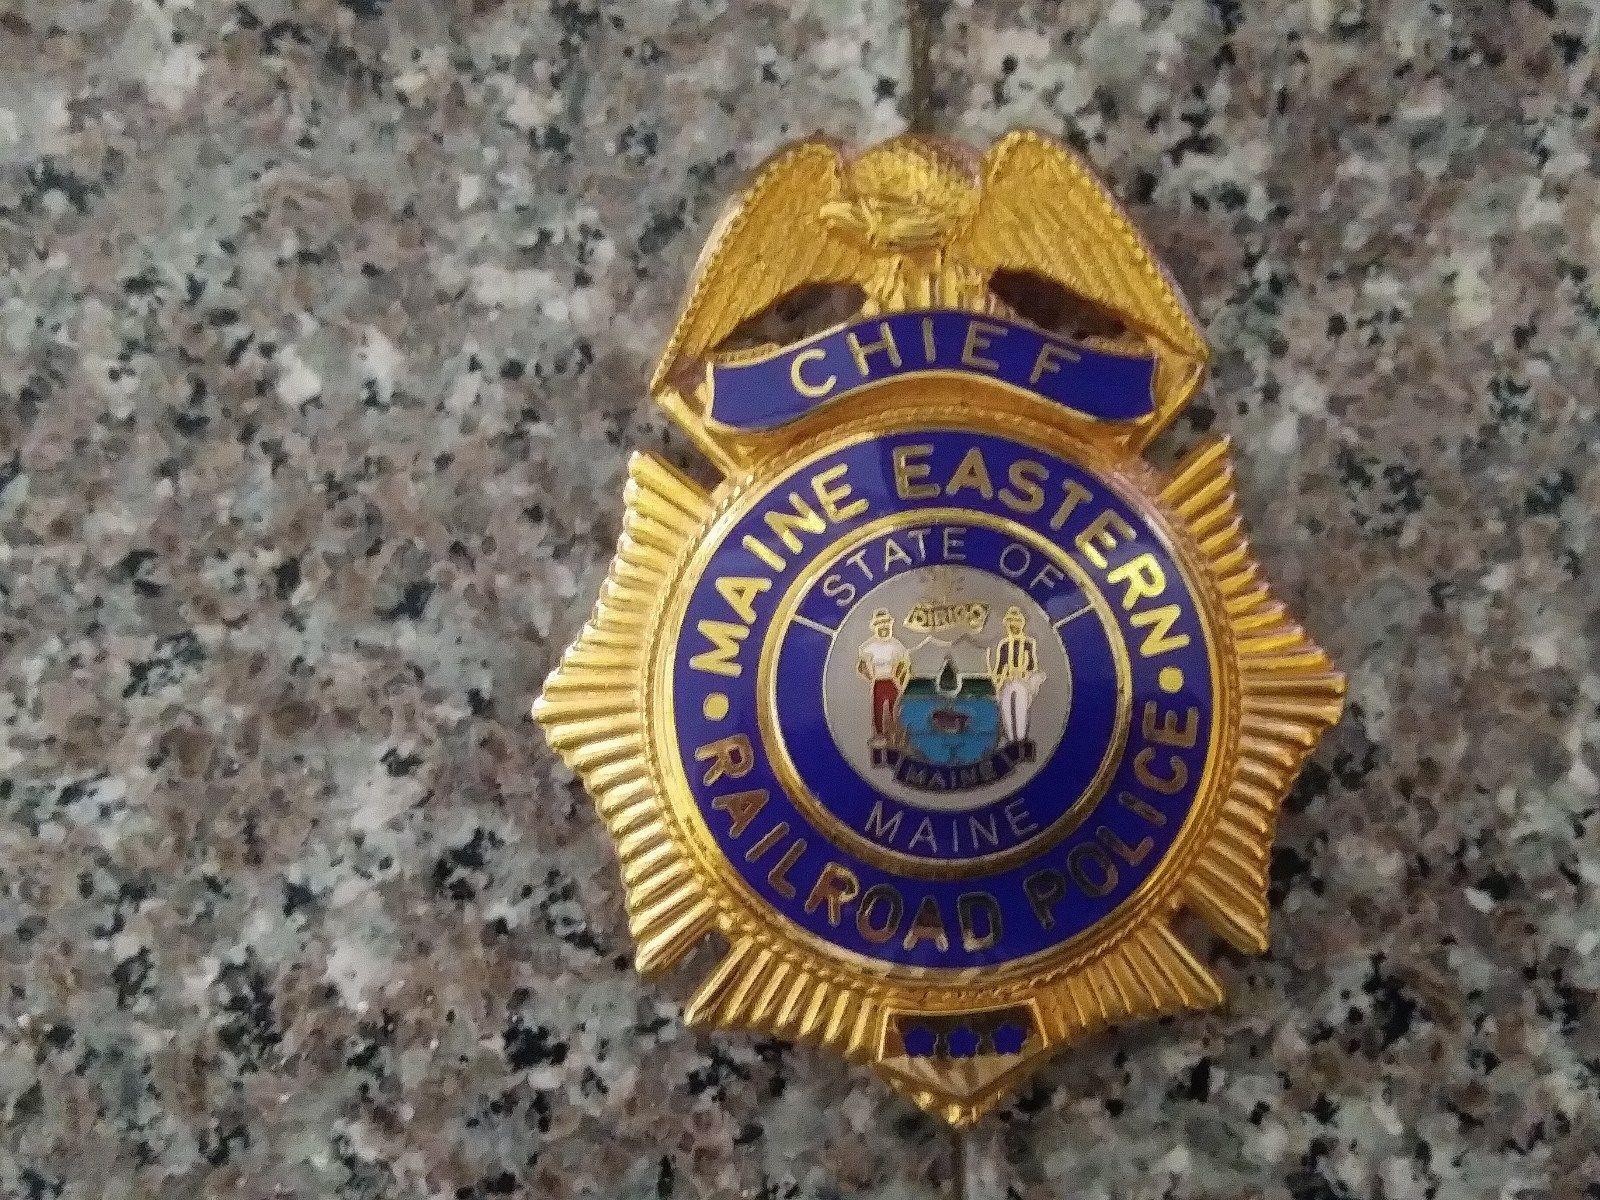 Chief maine eastern railroad police smith warren